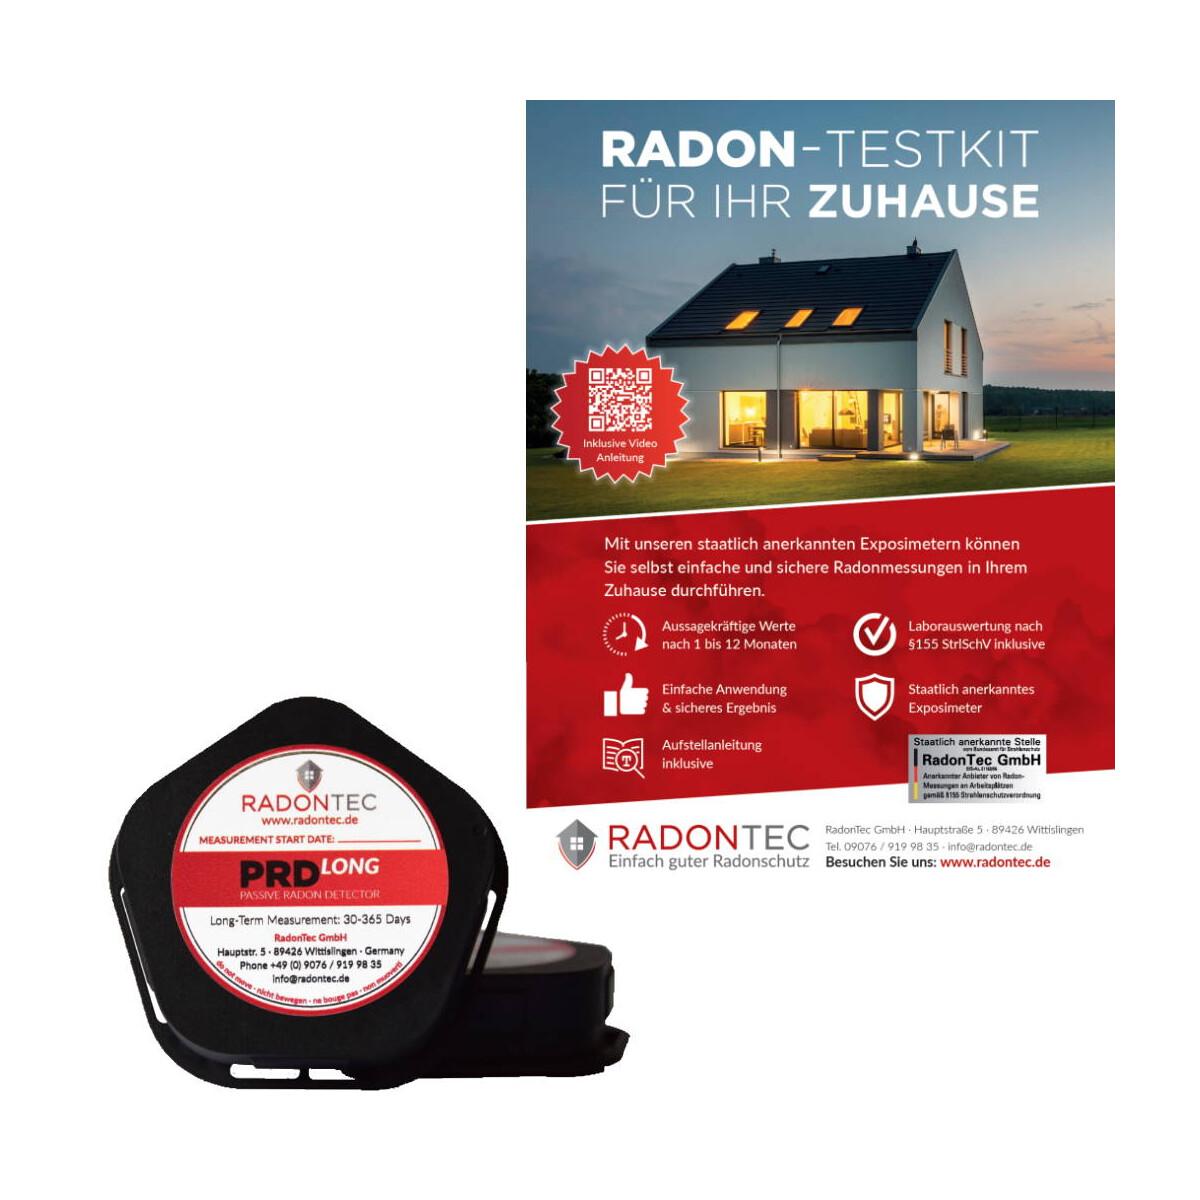 Radon Measuring for your Home